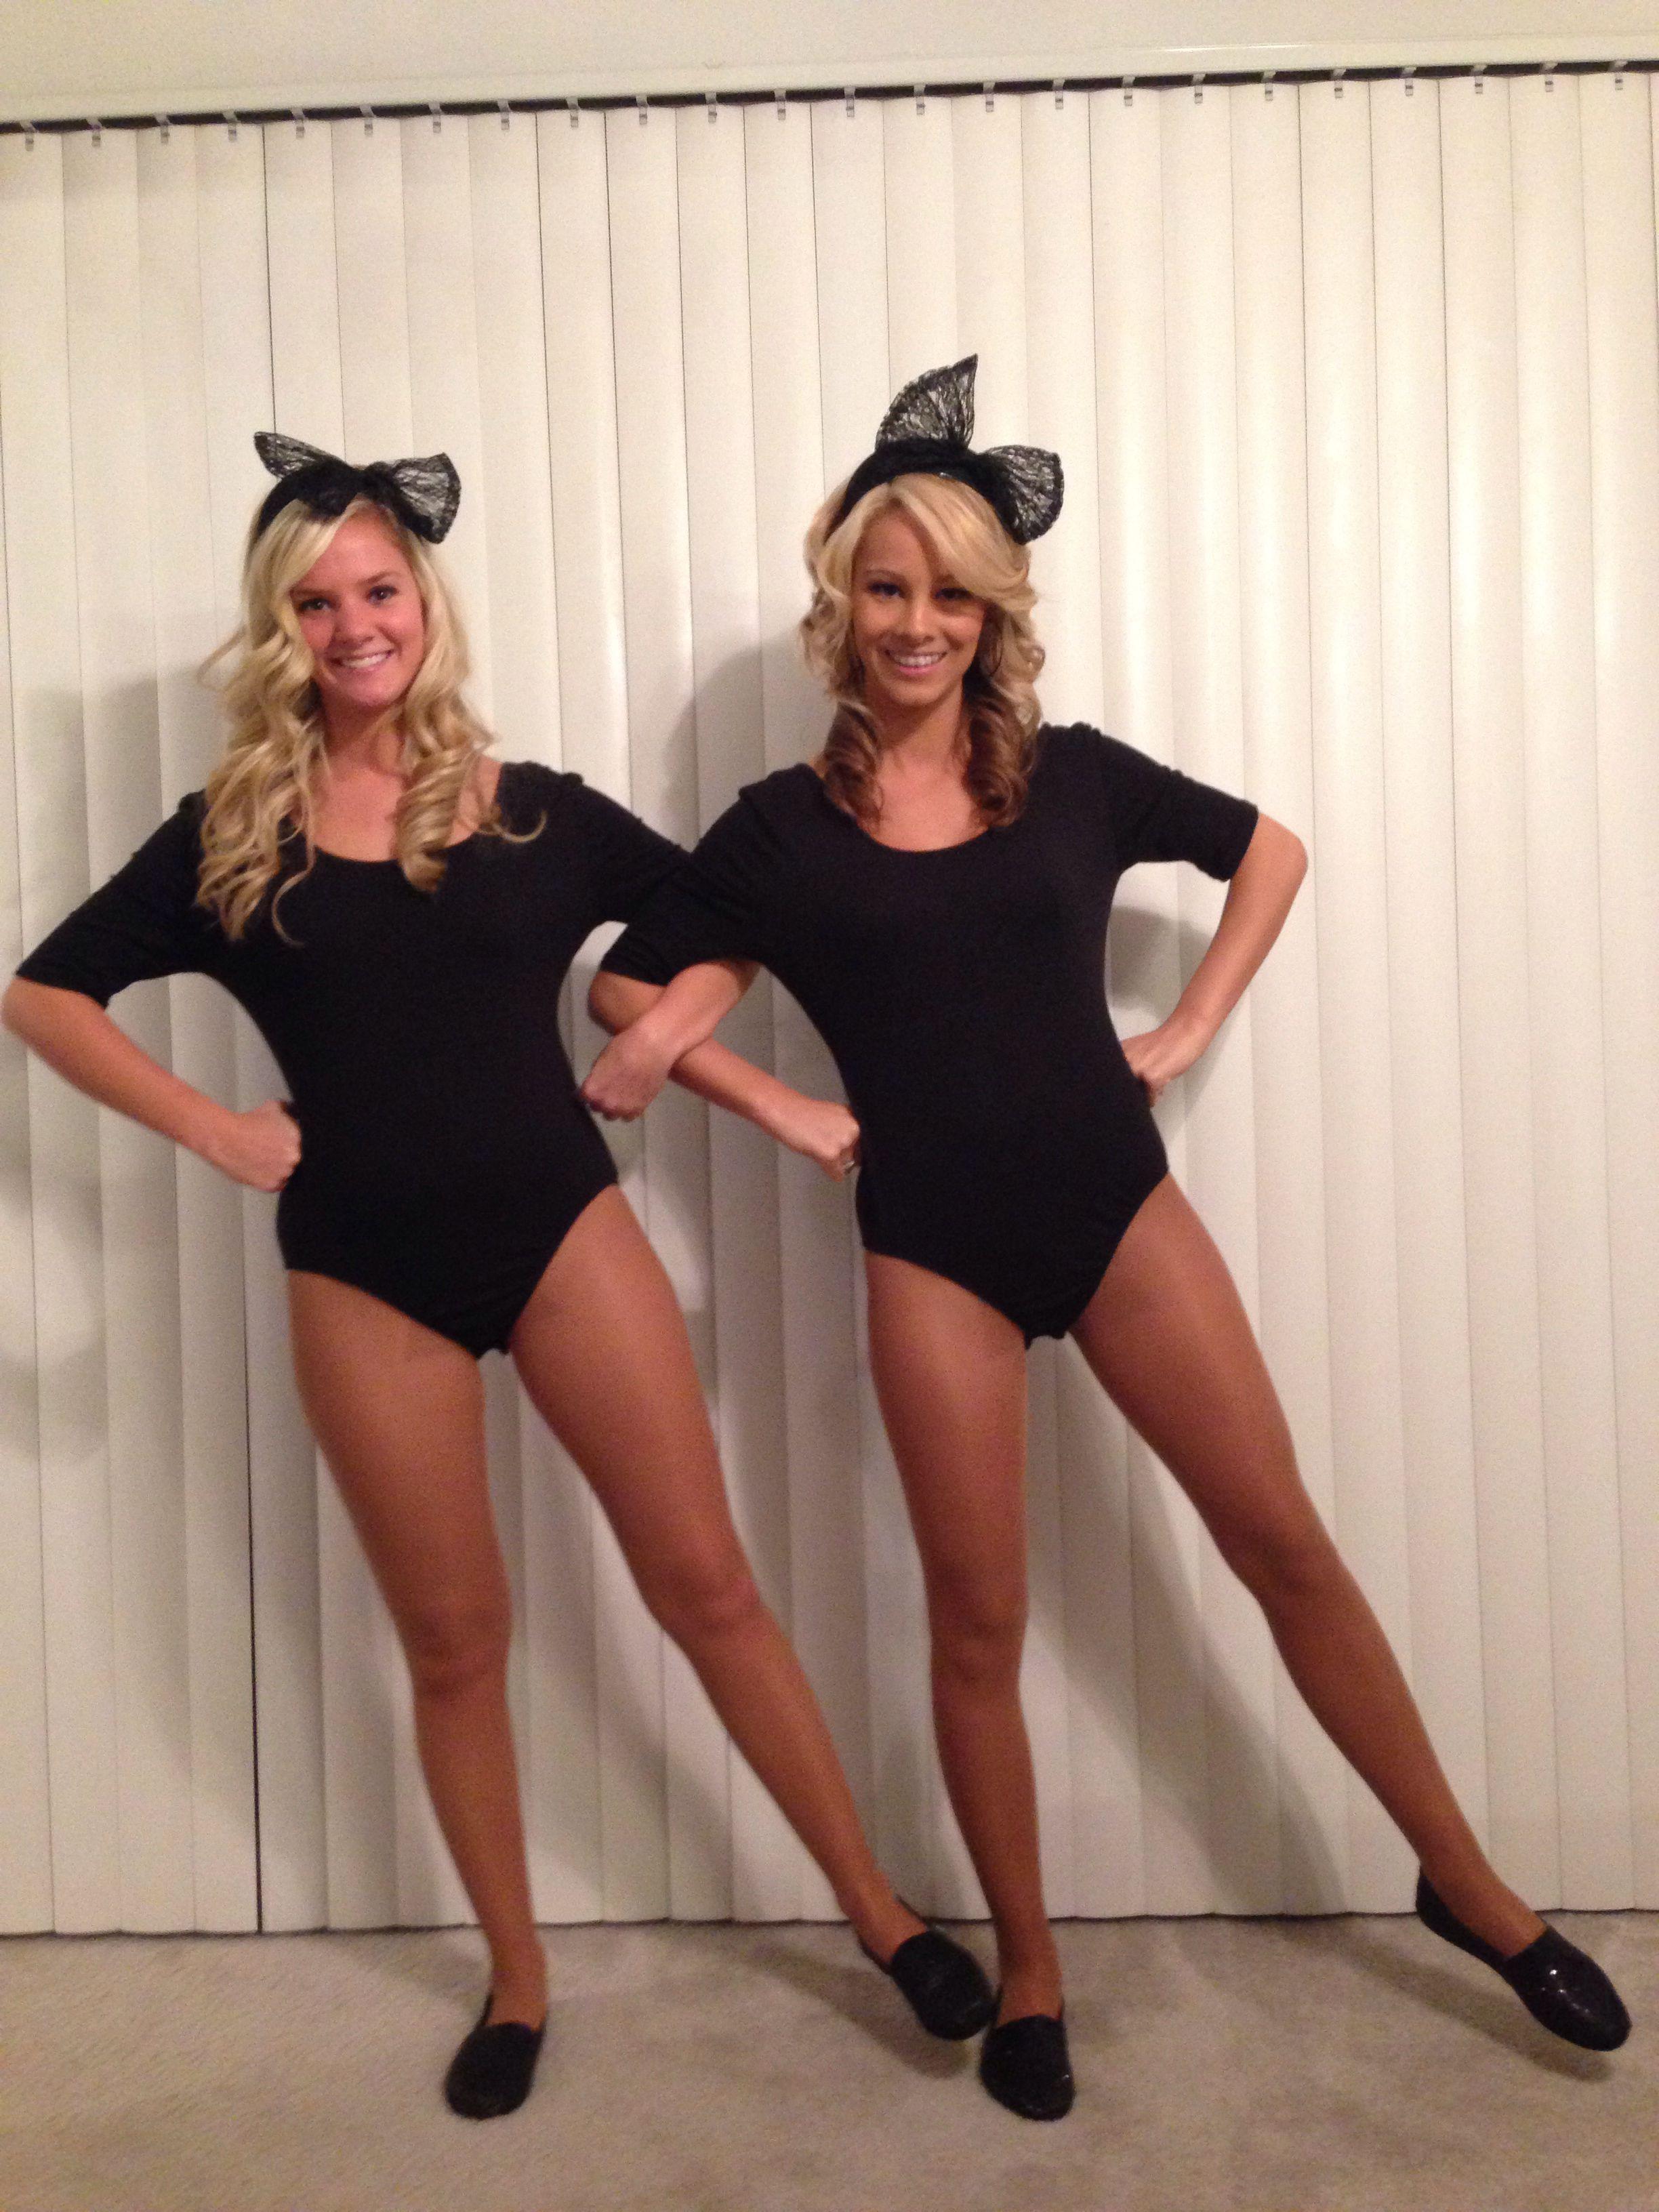 18 Cute Unique DIY Halloween Costumes For Best Friends - Cute Unique Halloween Costumes